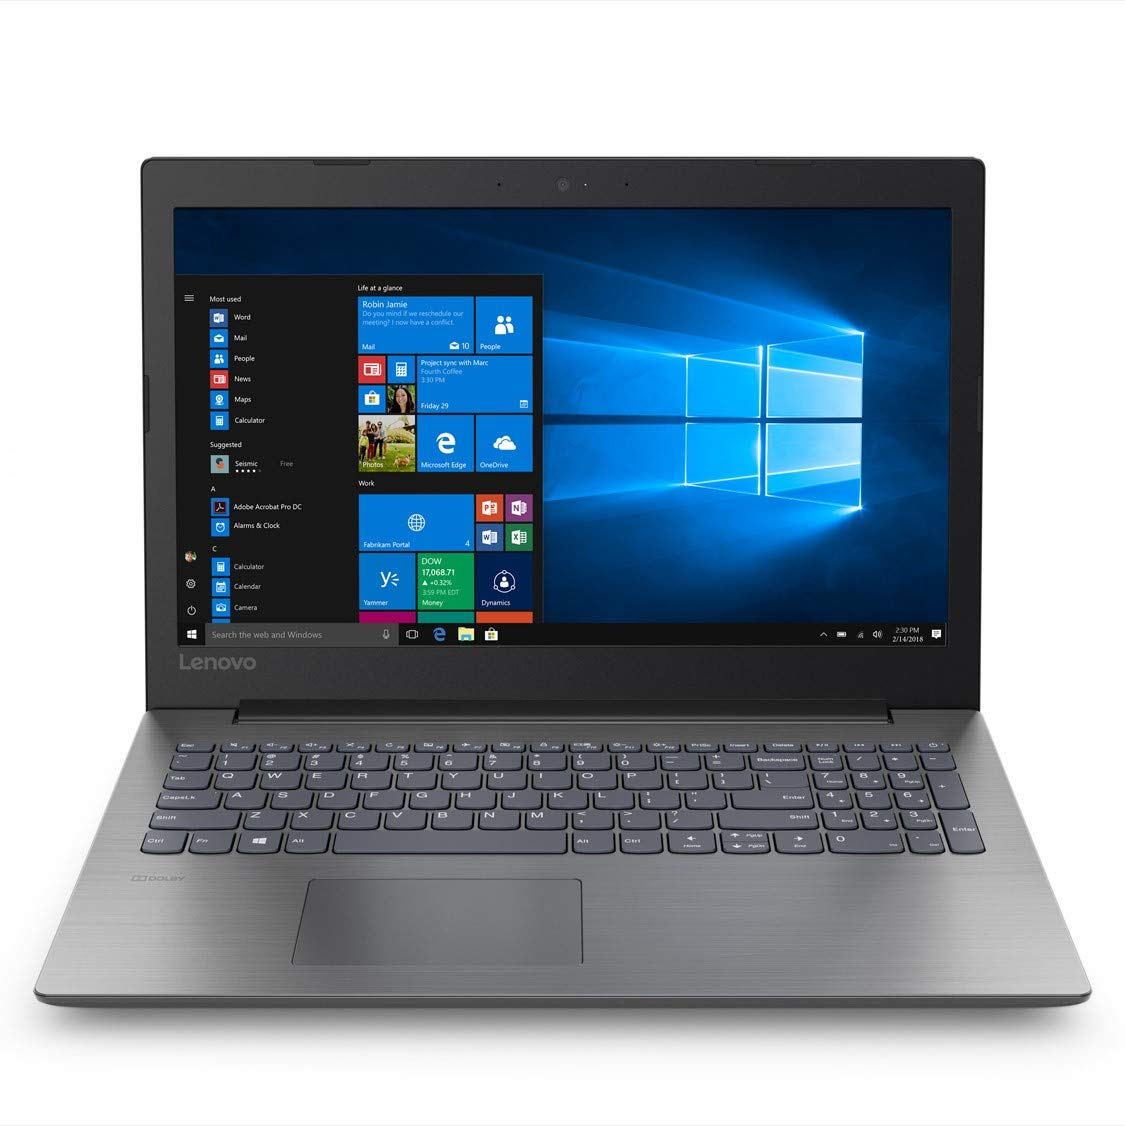 Lenovo Ideapad 330 Intel Core i7 8th Gen 15.6 inch Laptop